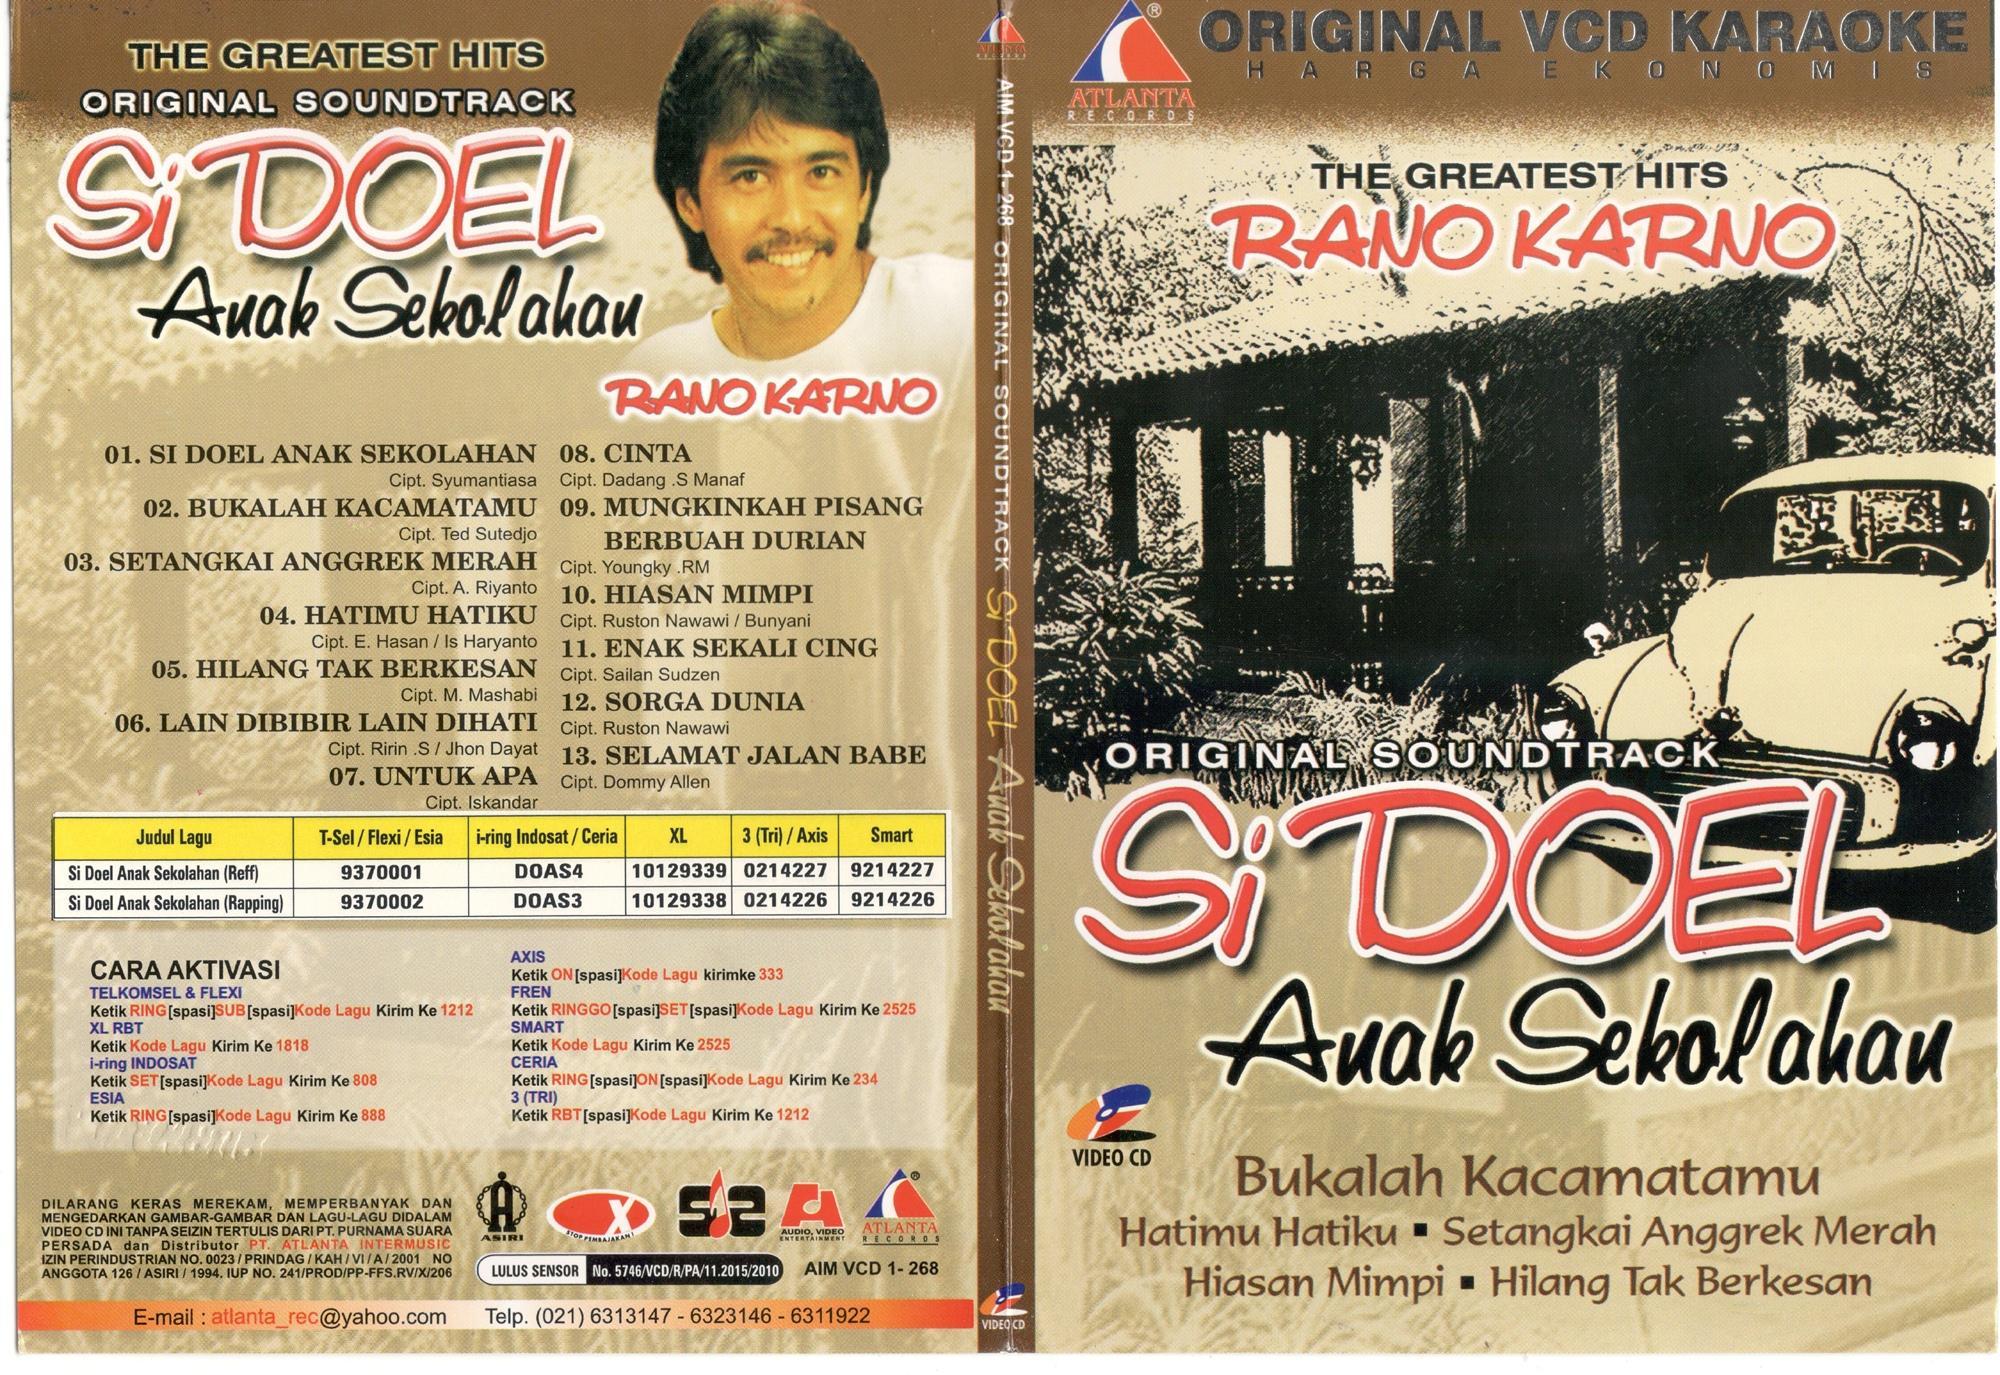 VCD KARAOKE ORIGINAL HARGA EKONOMIS THE GREATEST HITS RANO KARNO